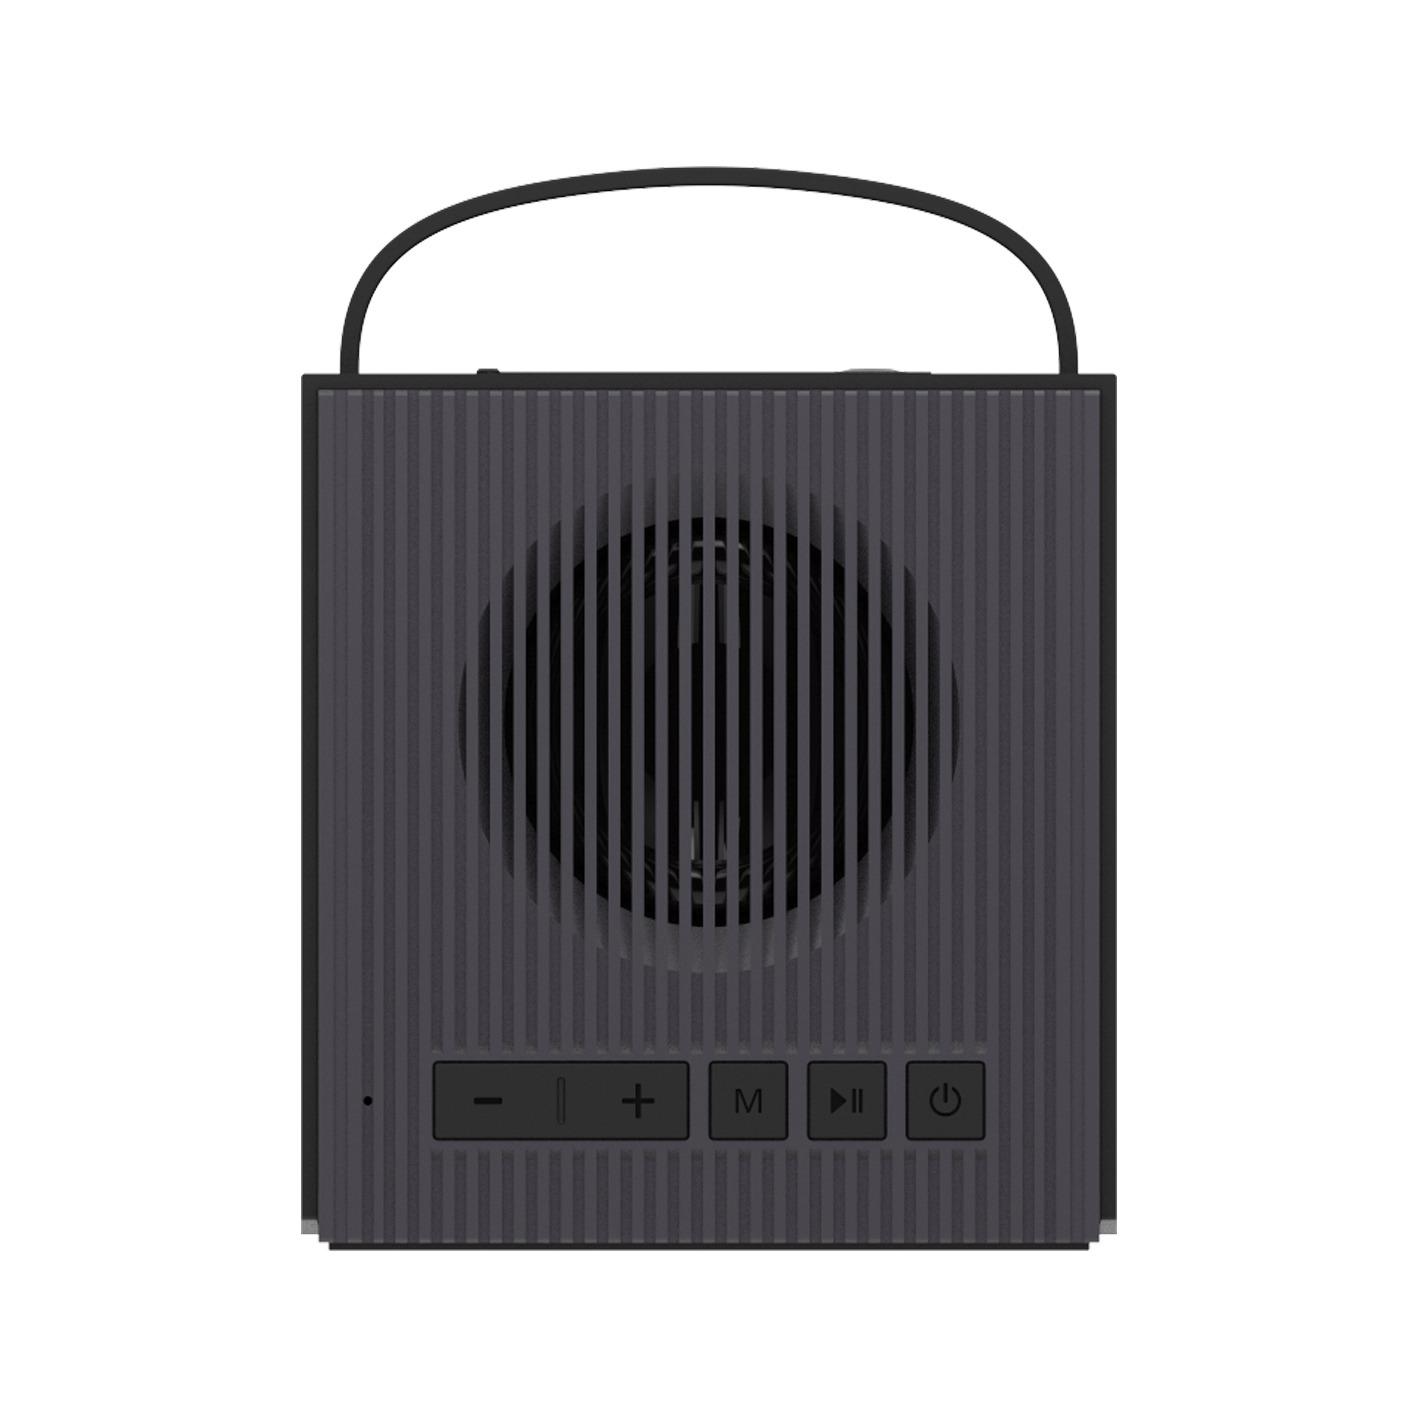 Creative Chrono Wireless Bluetooth Speaker and FM radio clock - Black image